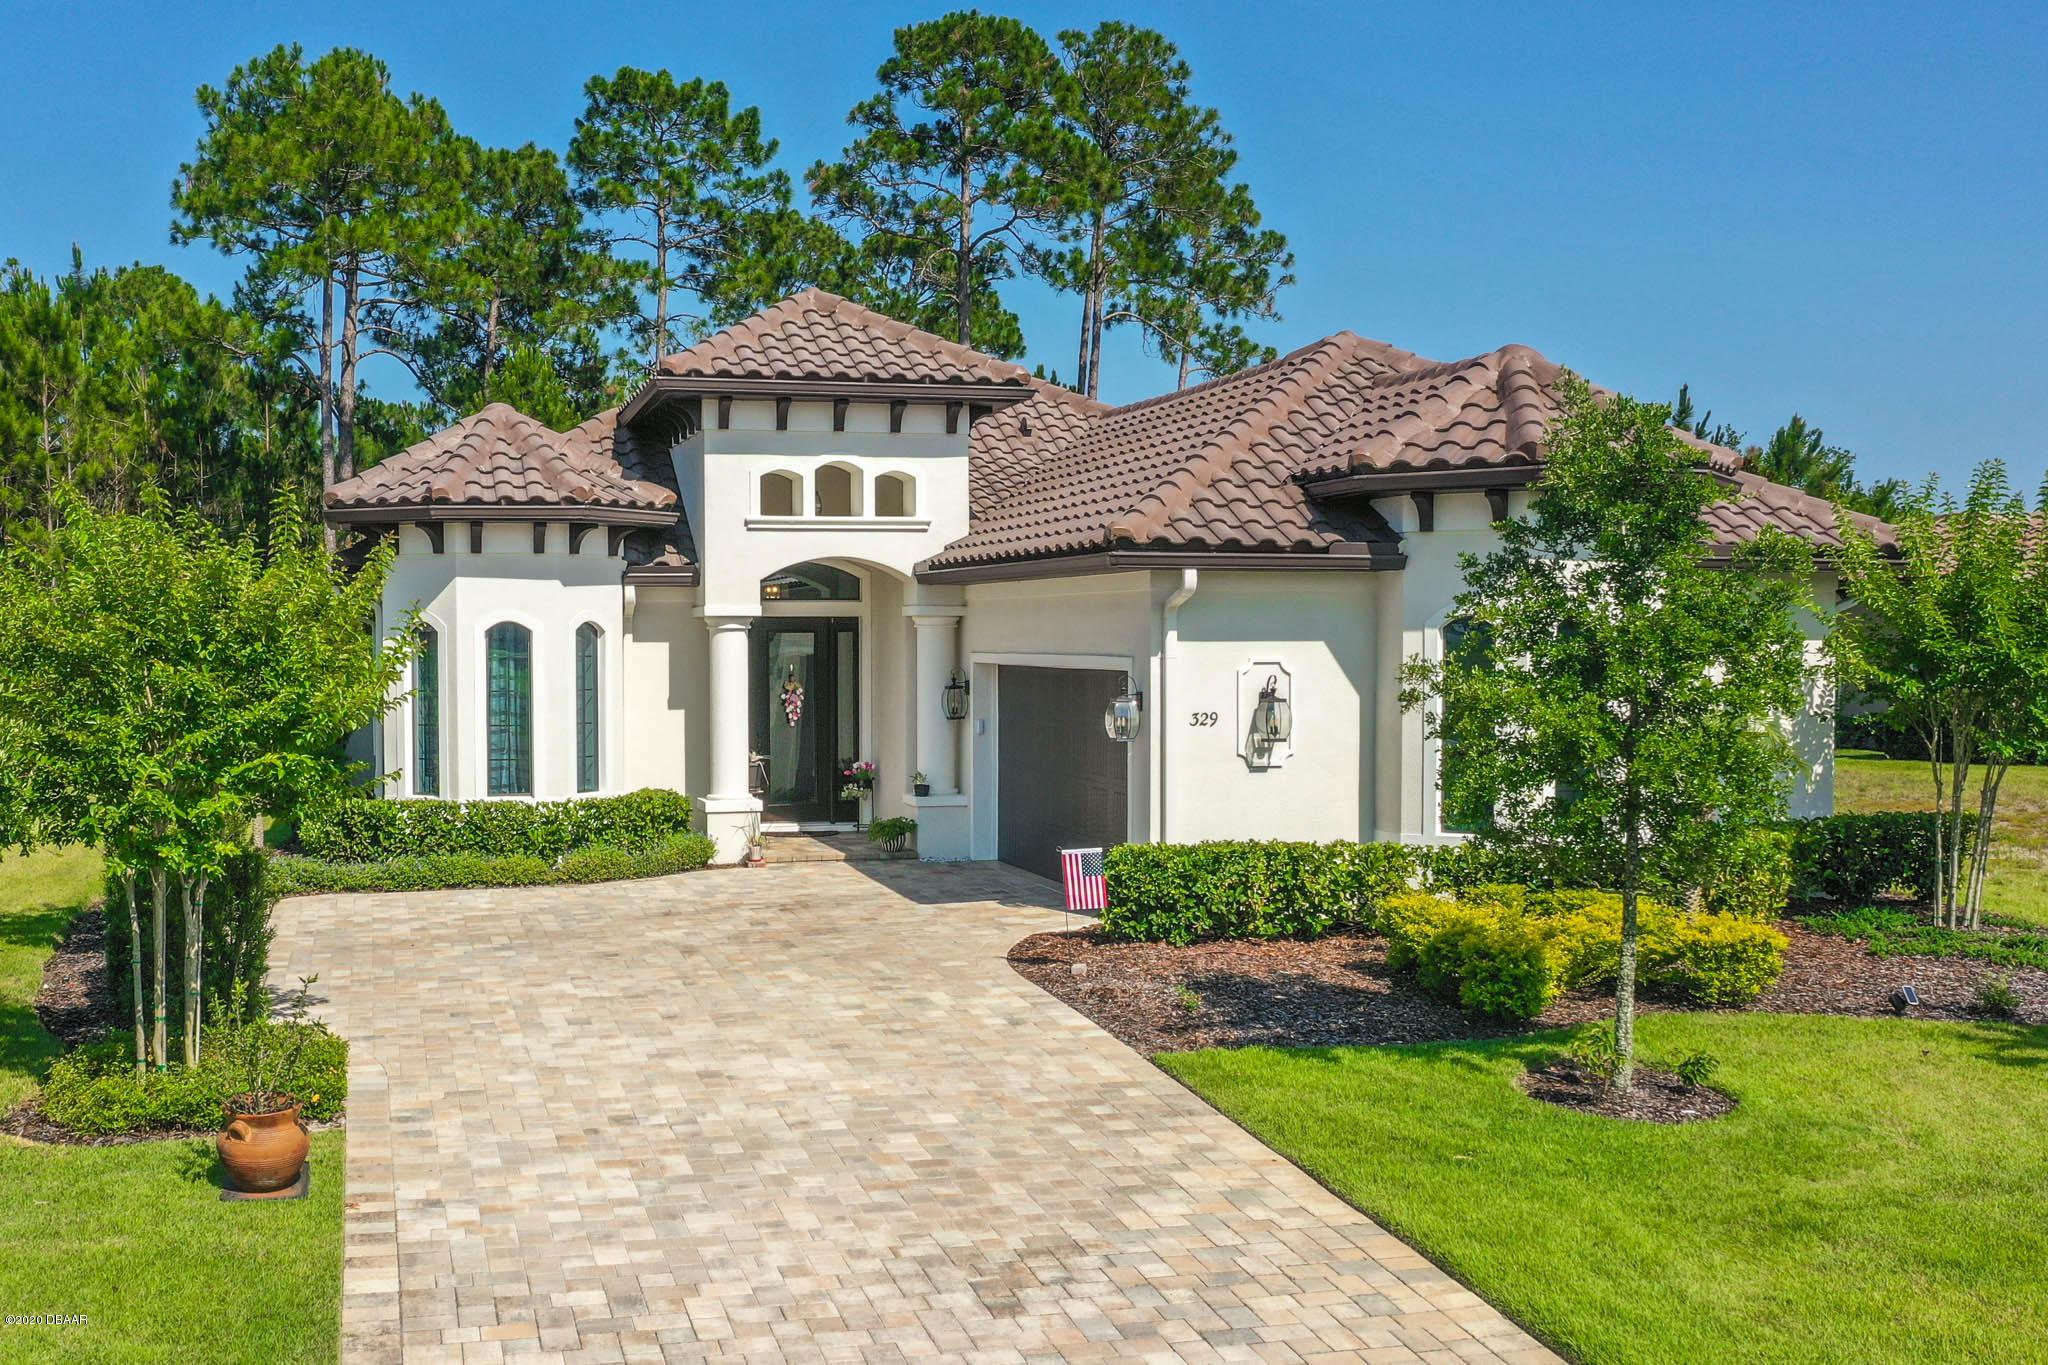 Photo of 329 Hibiscus Way, Palm Coast, FL 32137